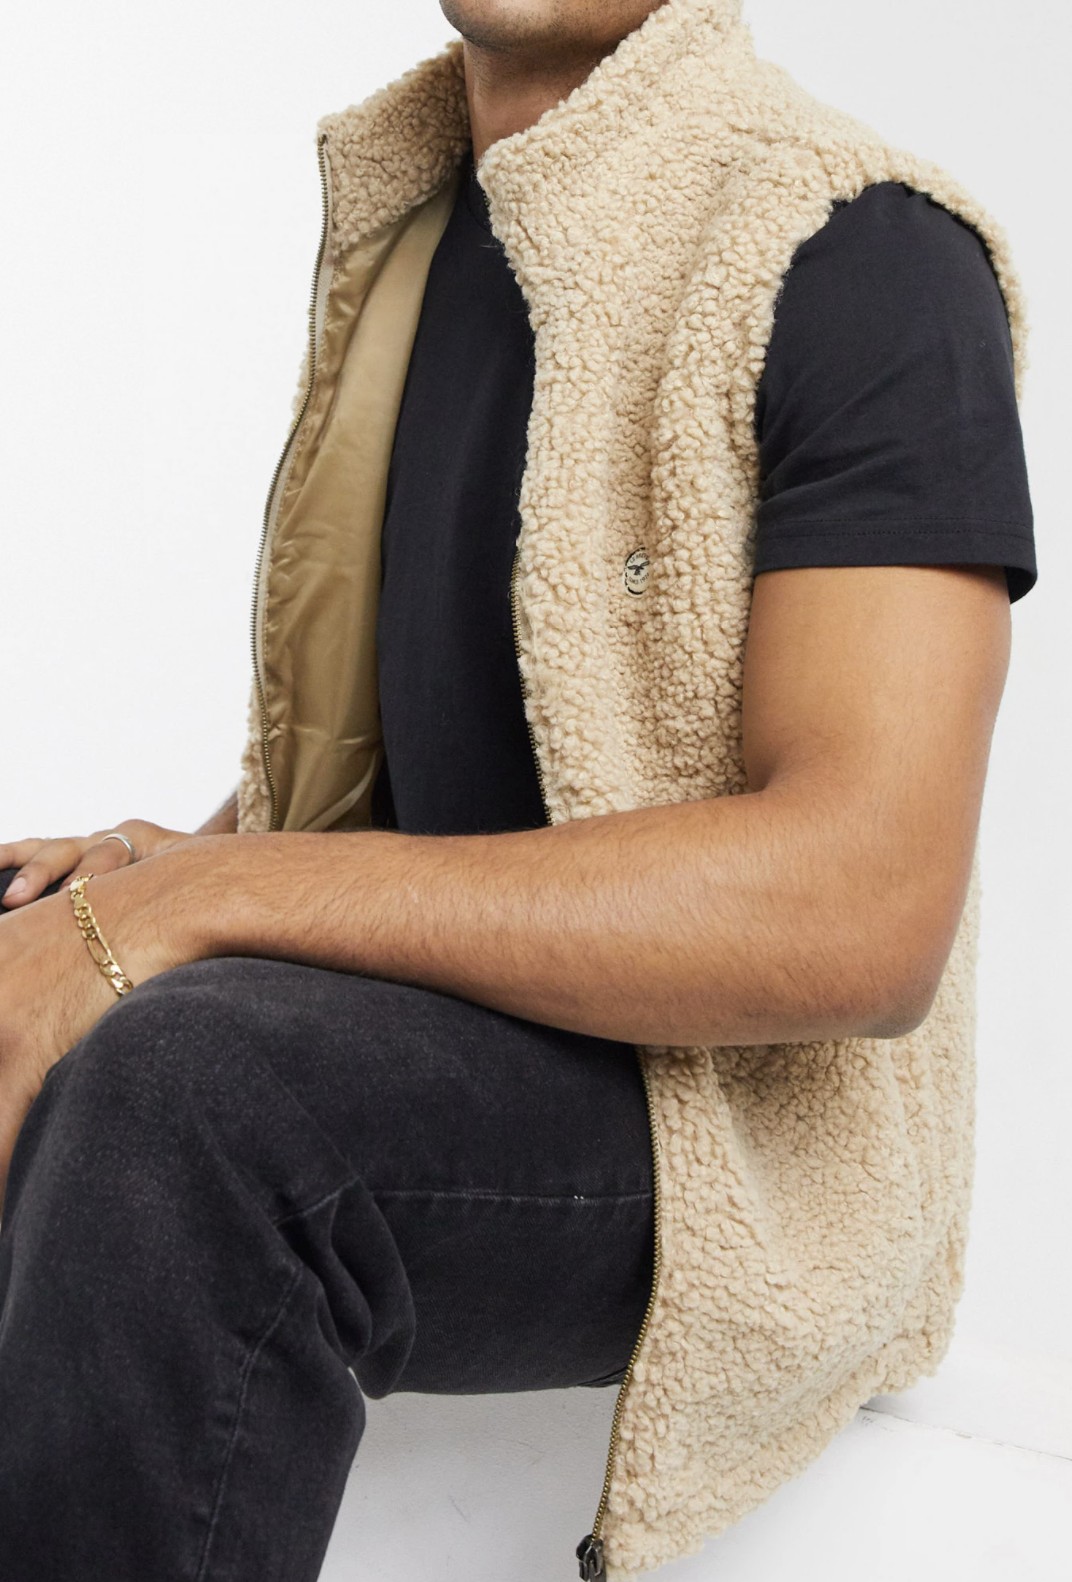 Chaleco crema con cuello alzado de borreguito de Le Breve